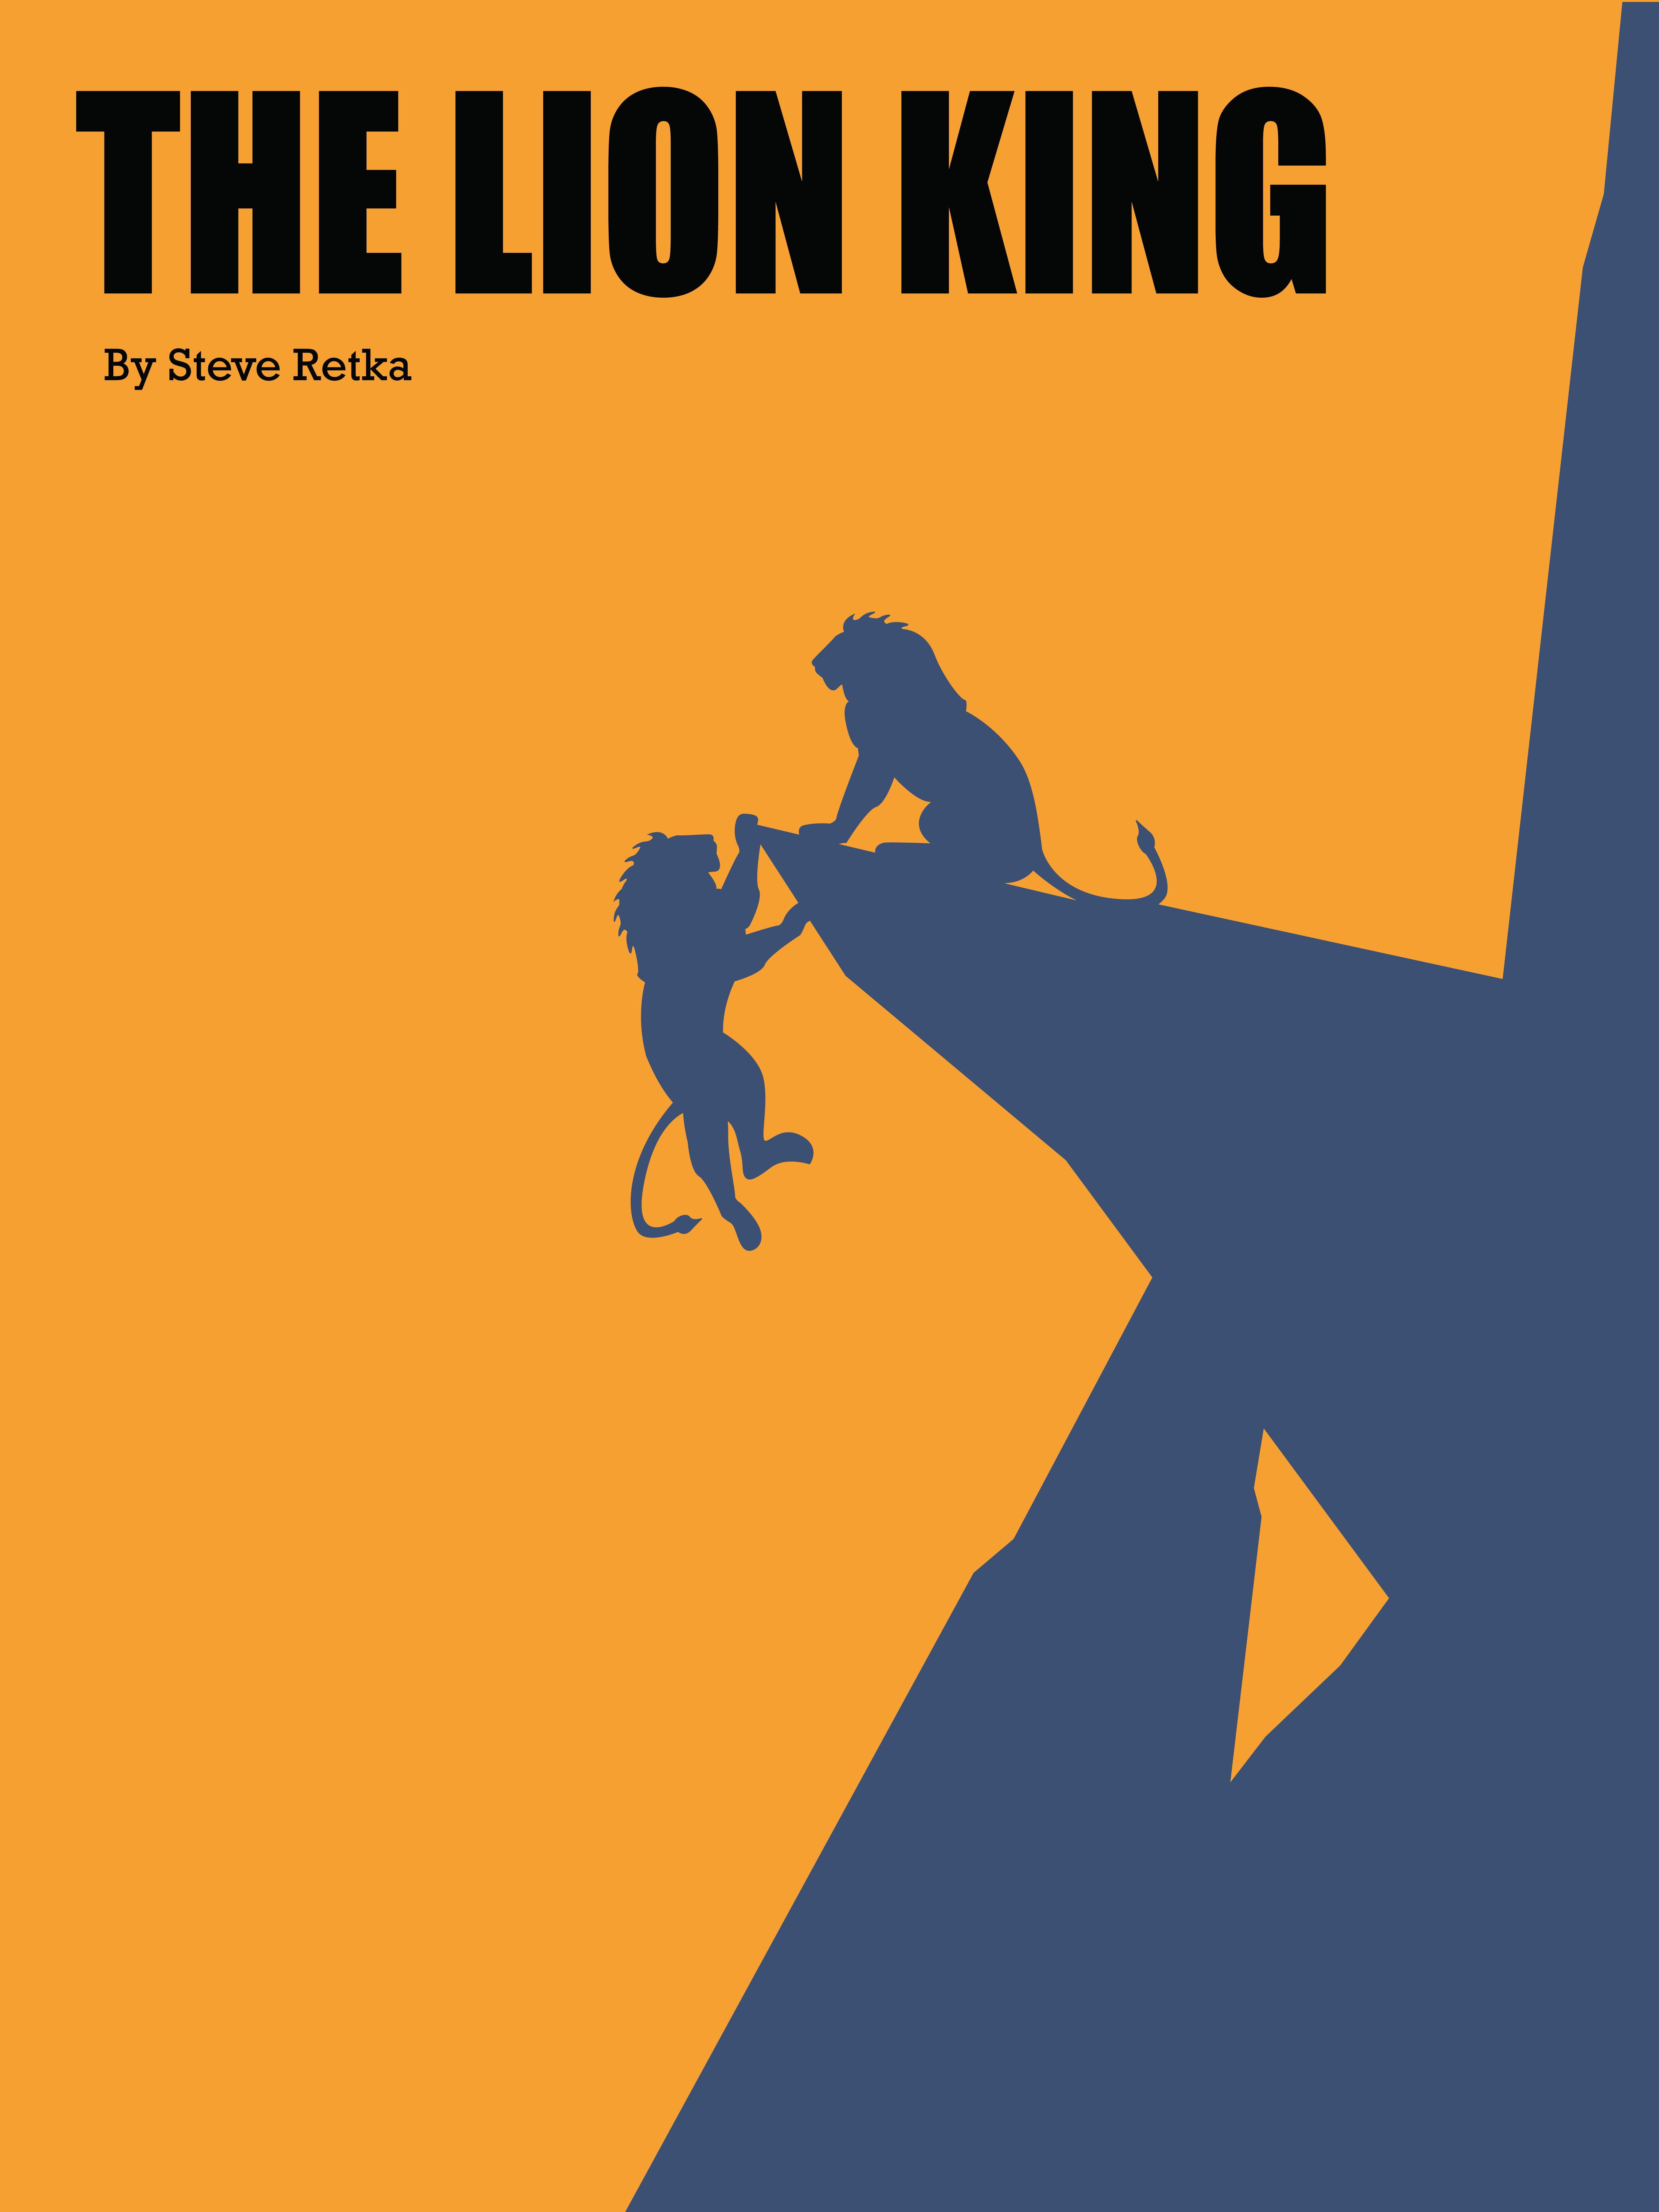 Lion king minimalist minimalist poster lions and for Minimalist living movie